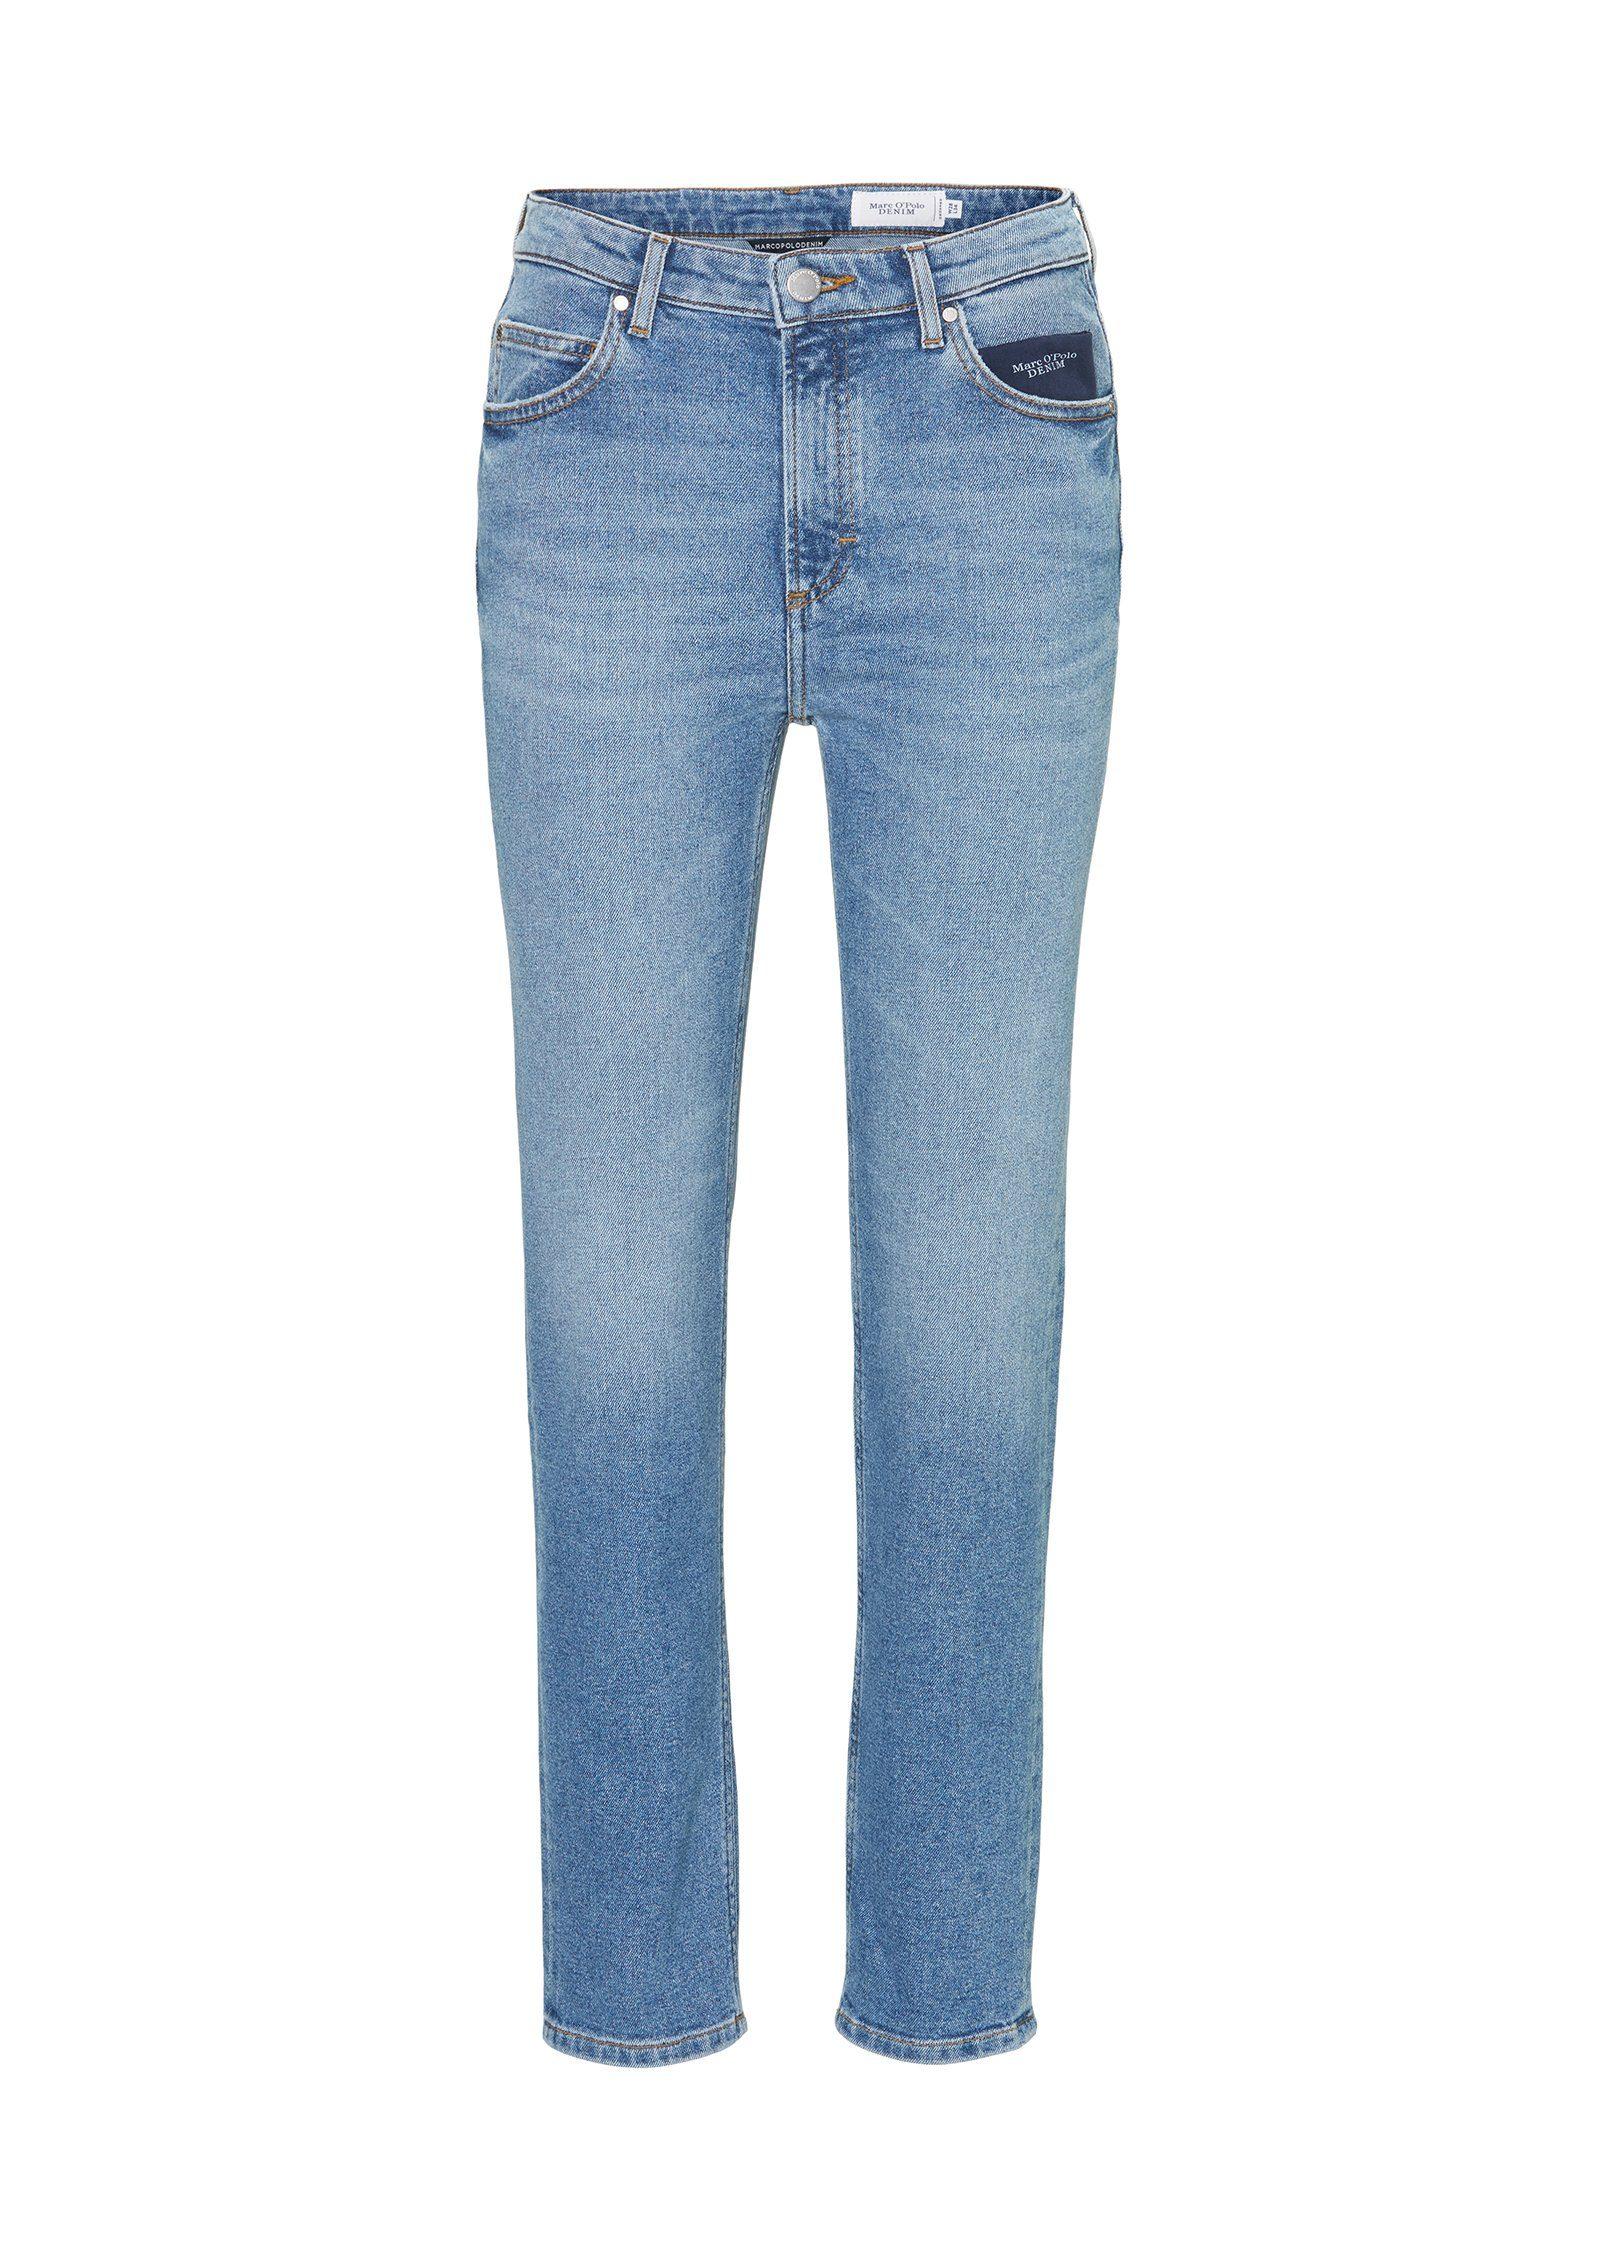 Denim Marc Online Kaufen O'polo Gerade Jeans uKcFTl1J35